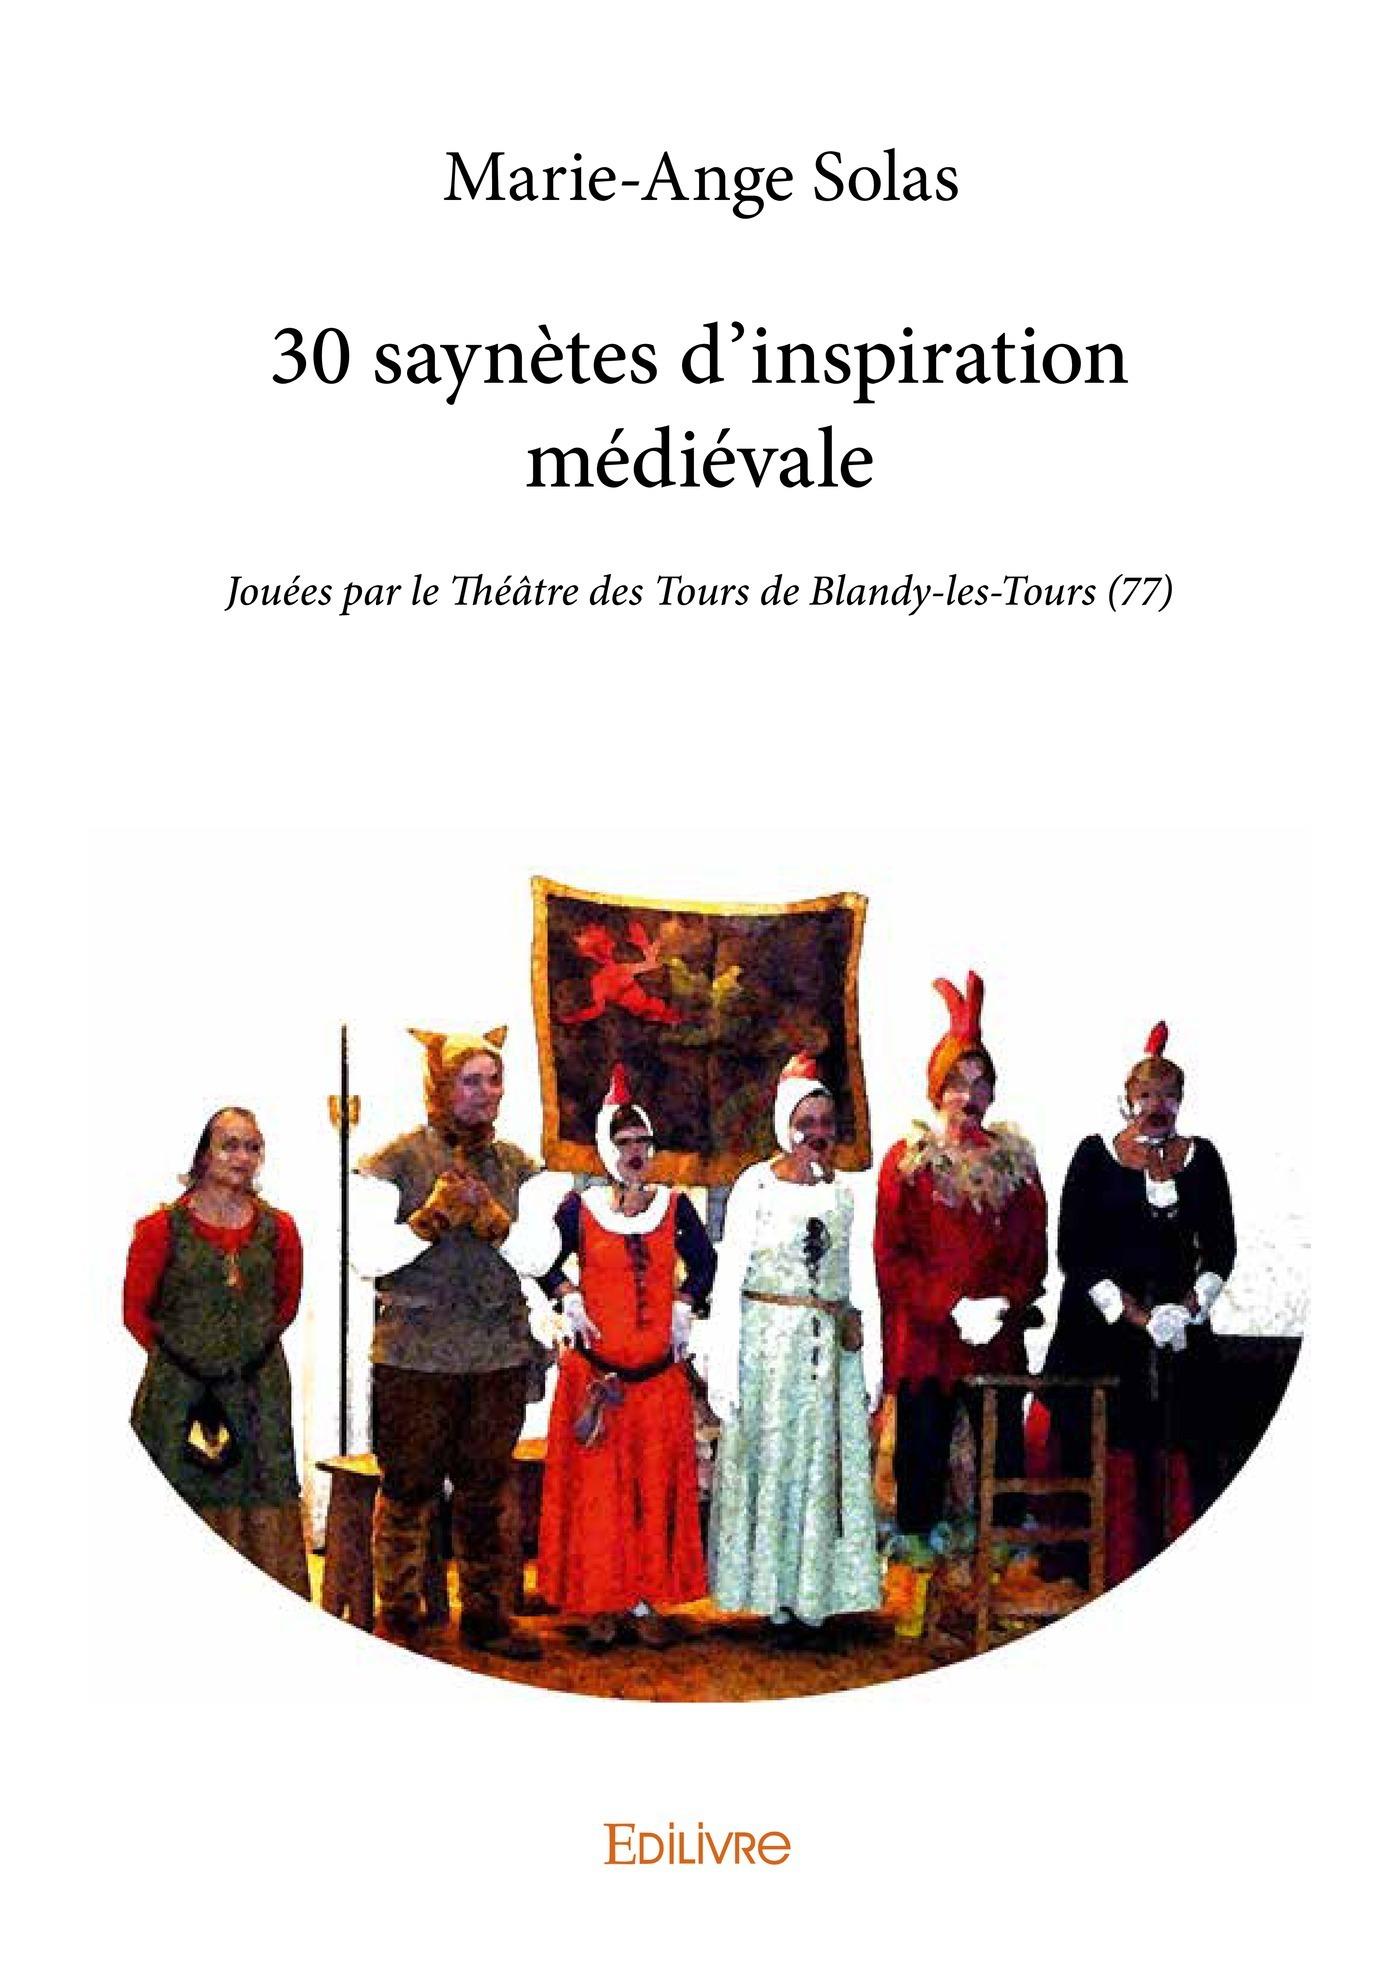 30 saynetes d'inspiration medievale